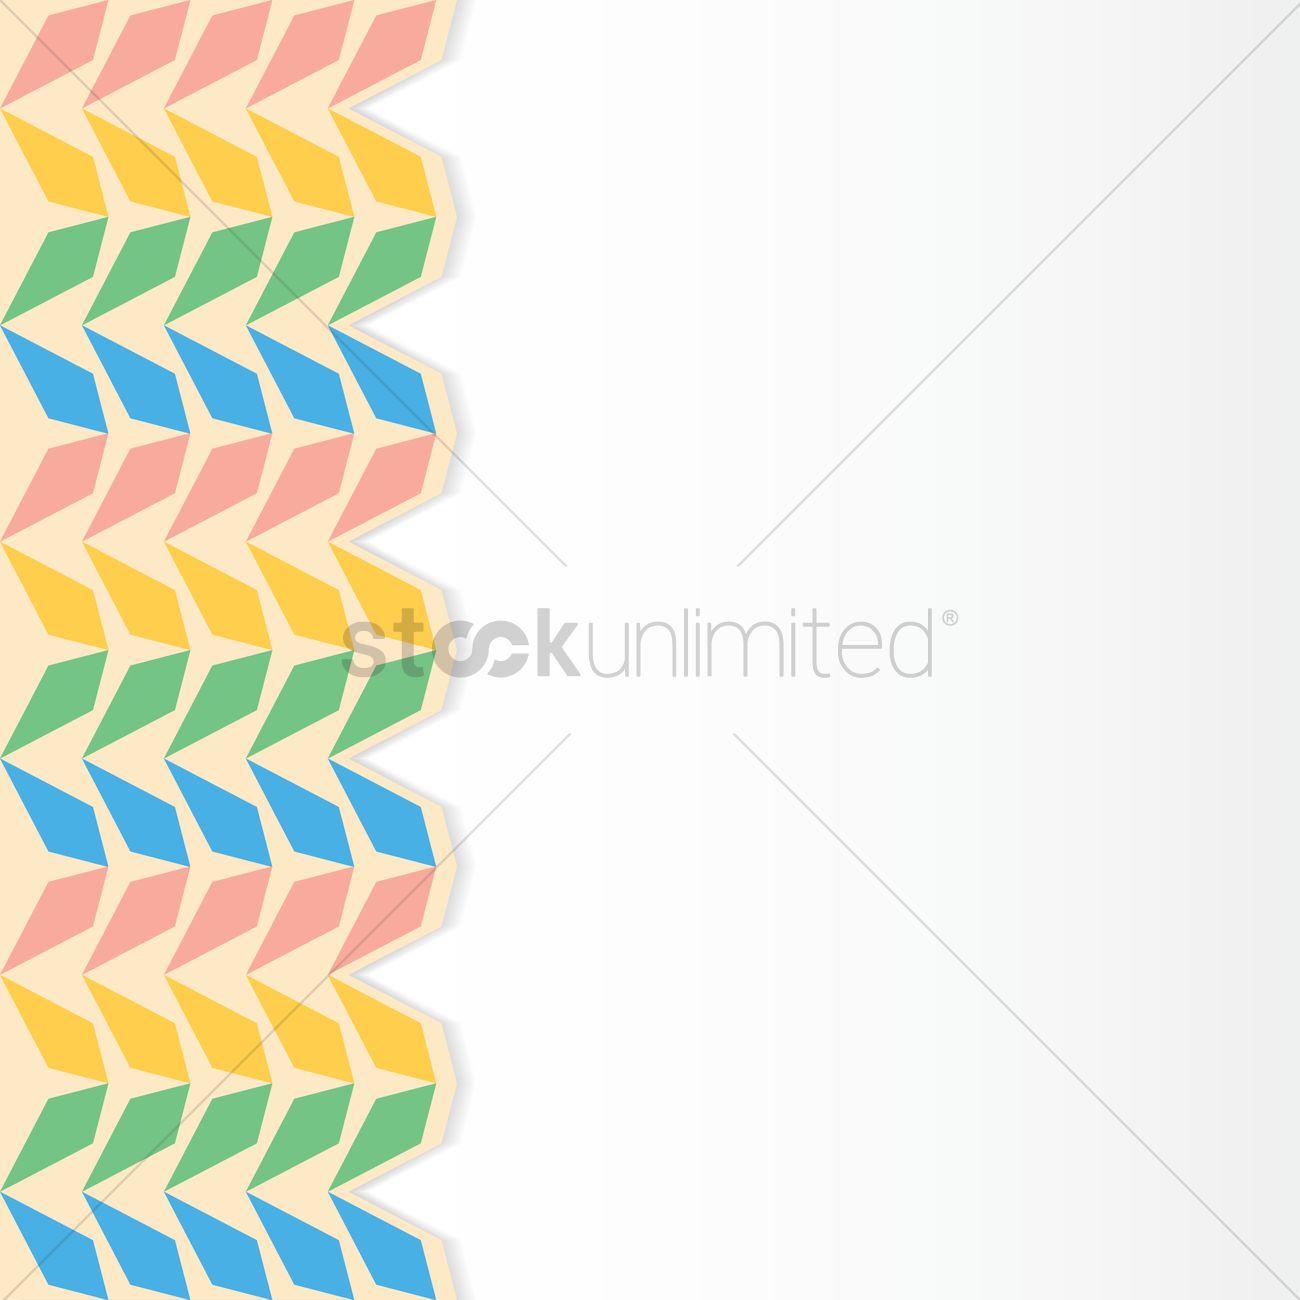 creative background design vector image 1960883 stockunlimited